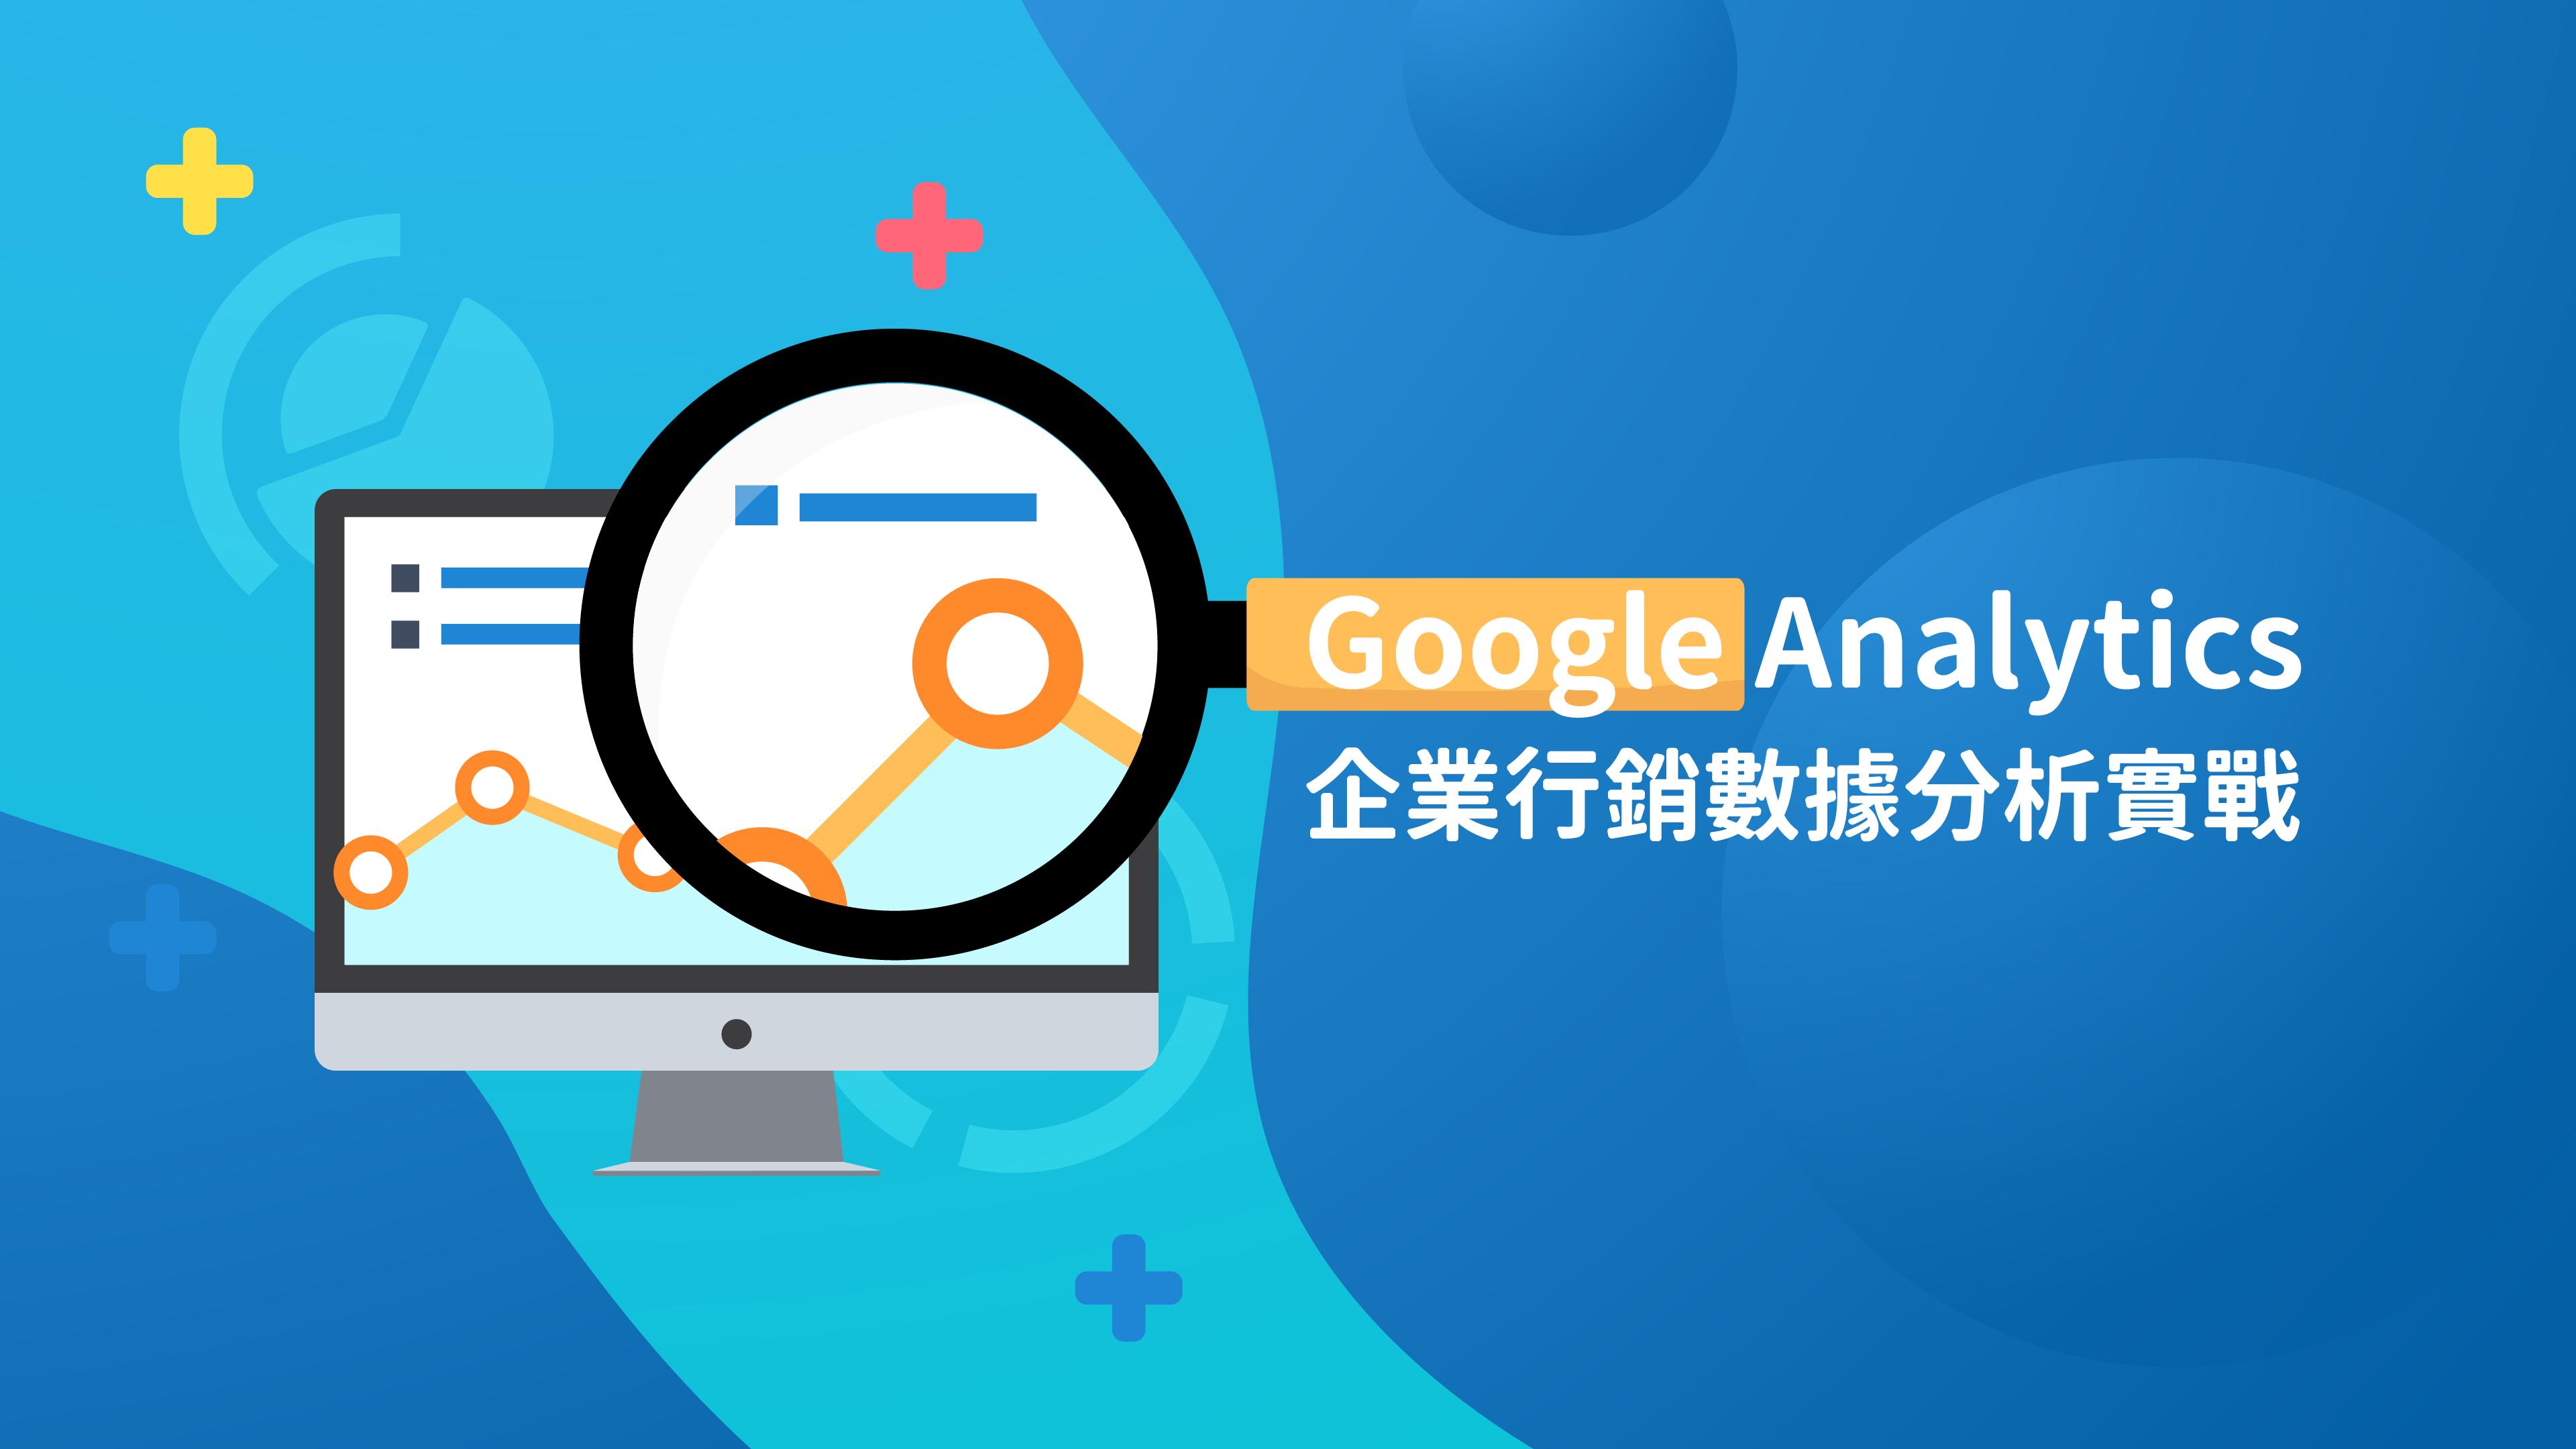 Google Analytics 企業行銷數據分析實戰